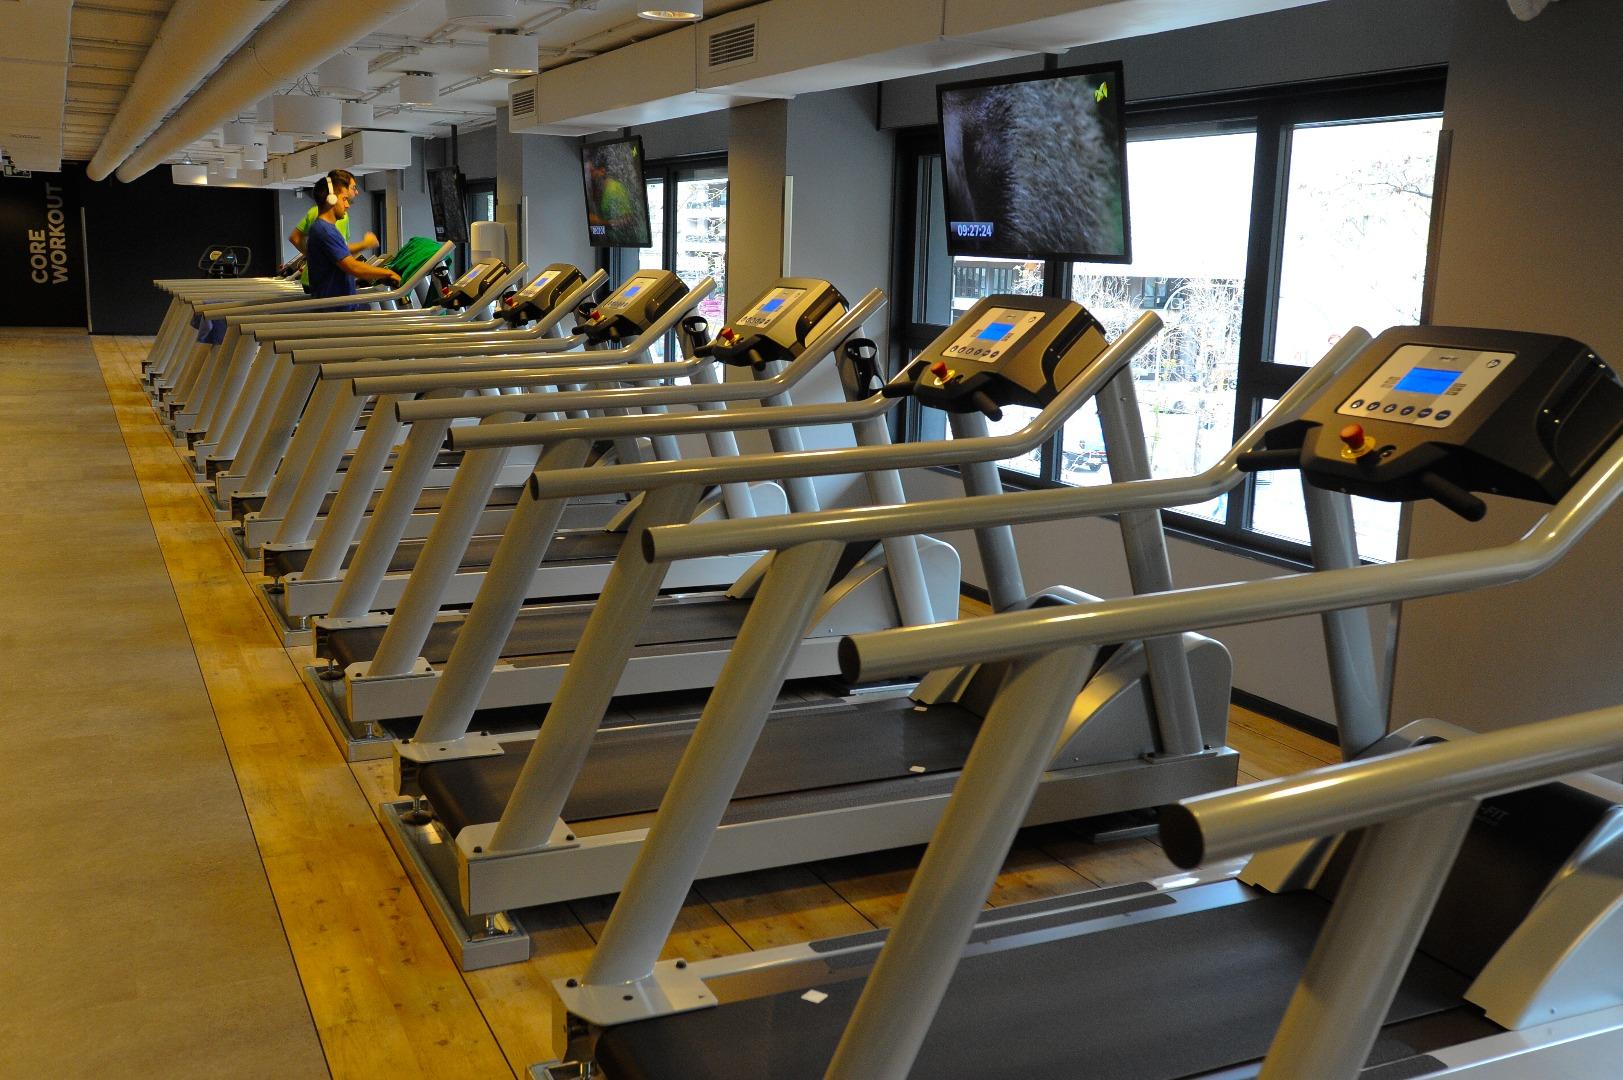 Picture 1 Deals for Gym McFIT Hospitalet - C.C La Farga L'Hospitalet de Llobregat